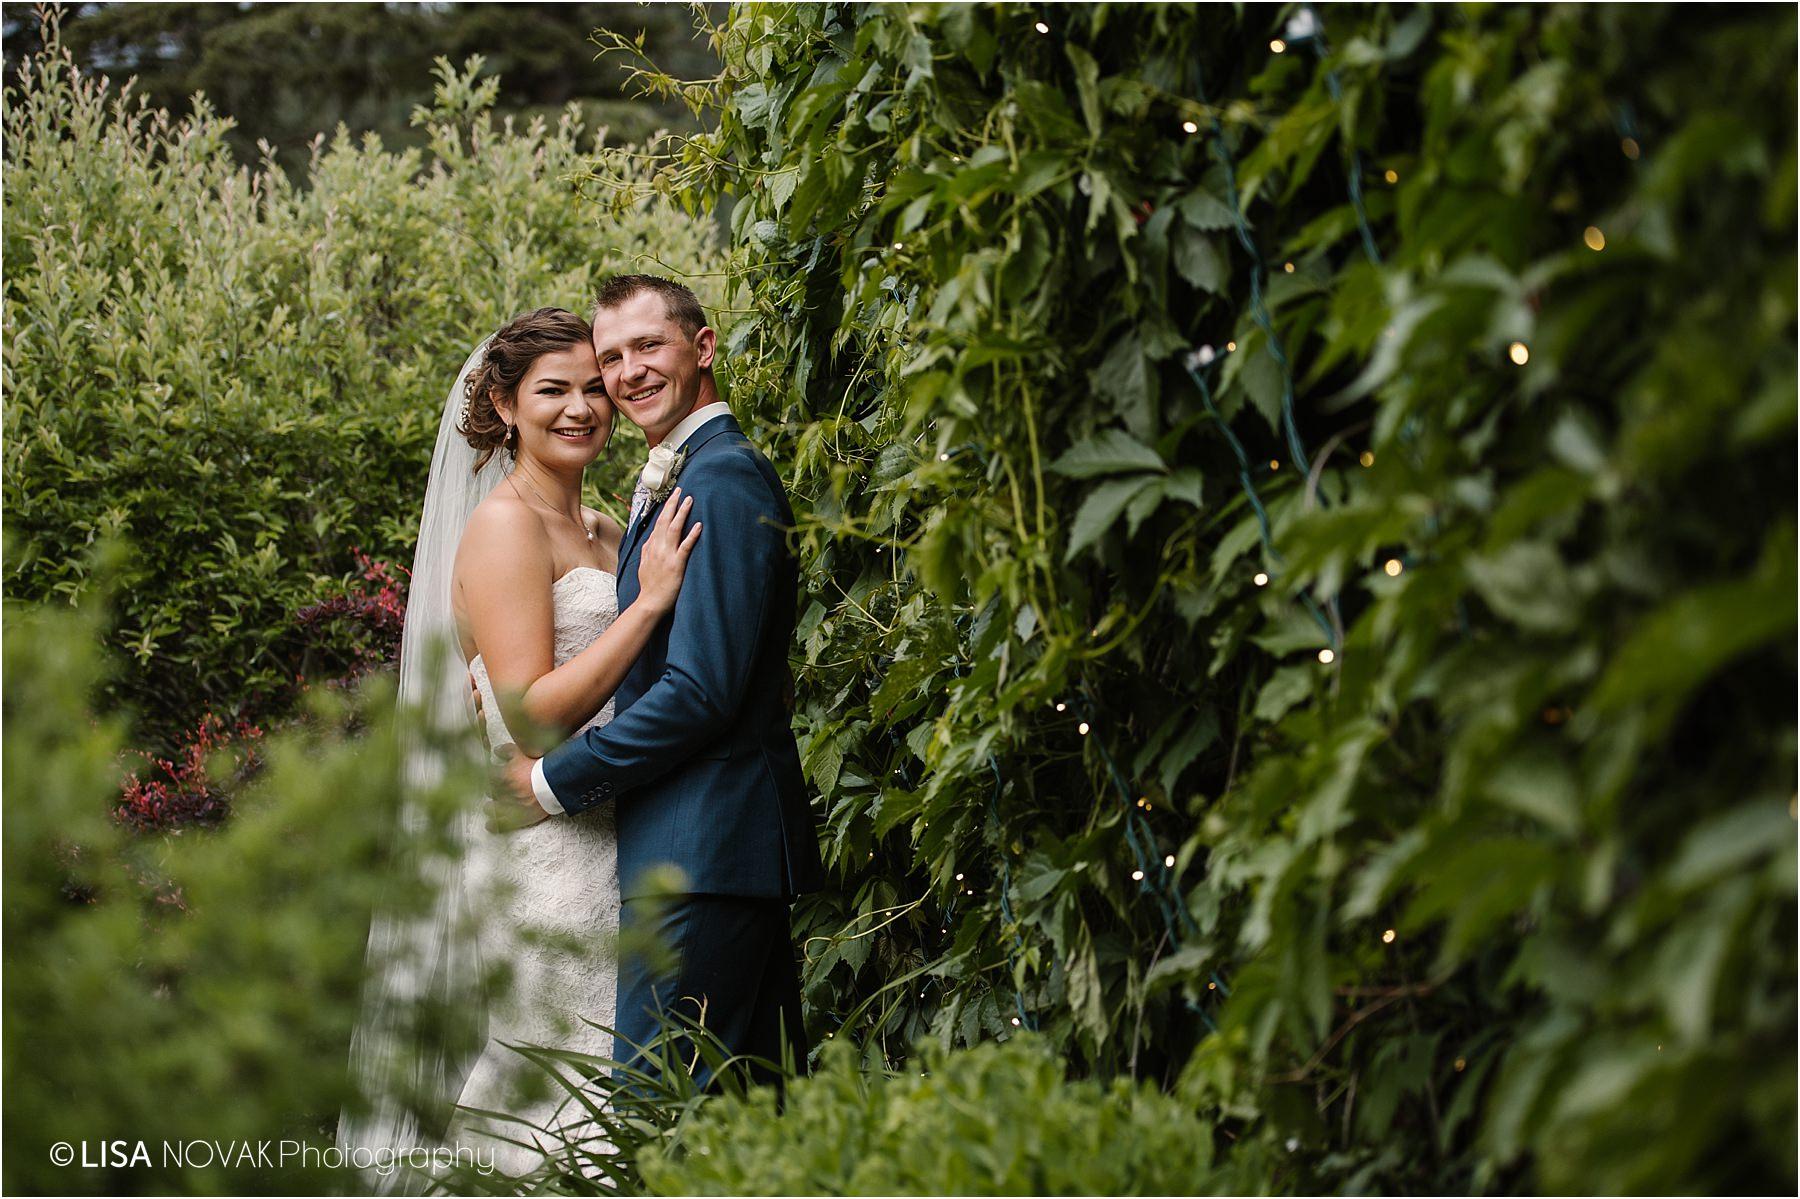 Okanagan wedding photographer BC Interior bride groom romantic epic garden bridal portraits first look twinkle lights